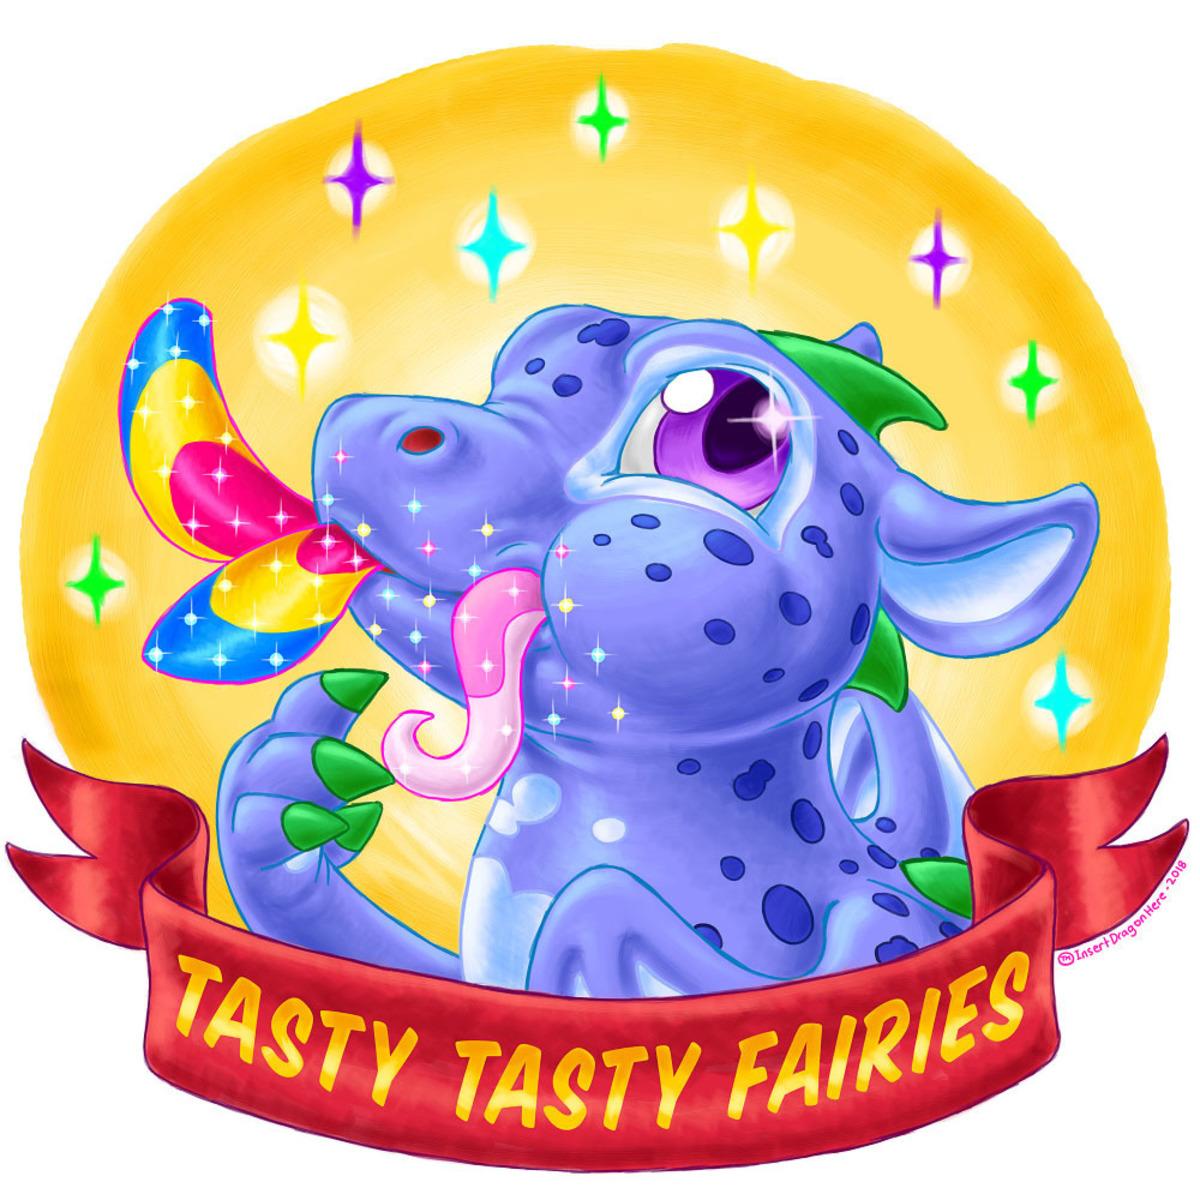 Tasty Tasty Fairies - Blueberry